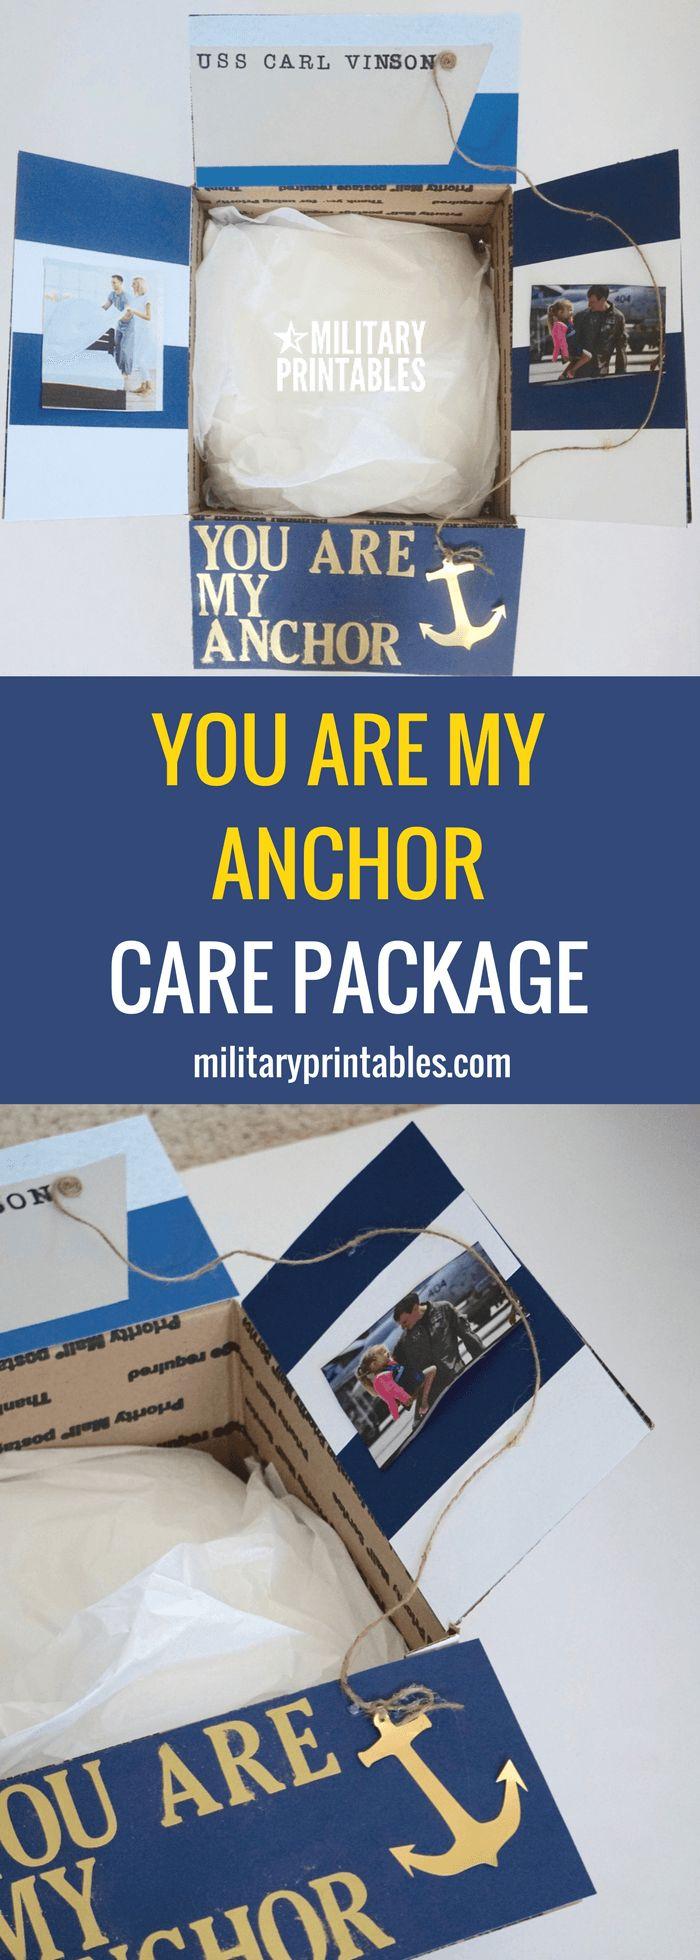 You Are My Anchor Care Package, nautical, sailor, navy, stripes, ship, ocean